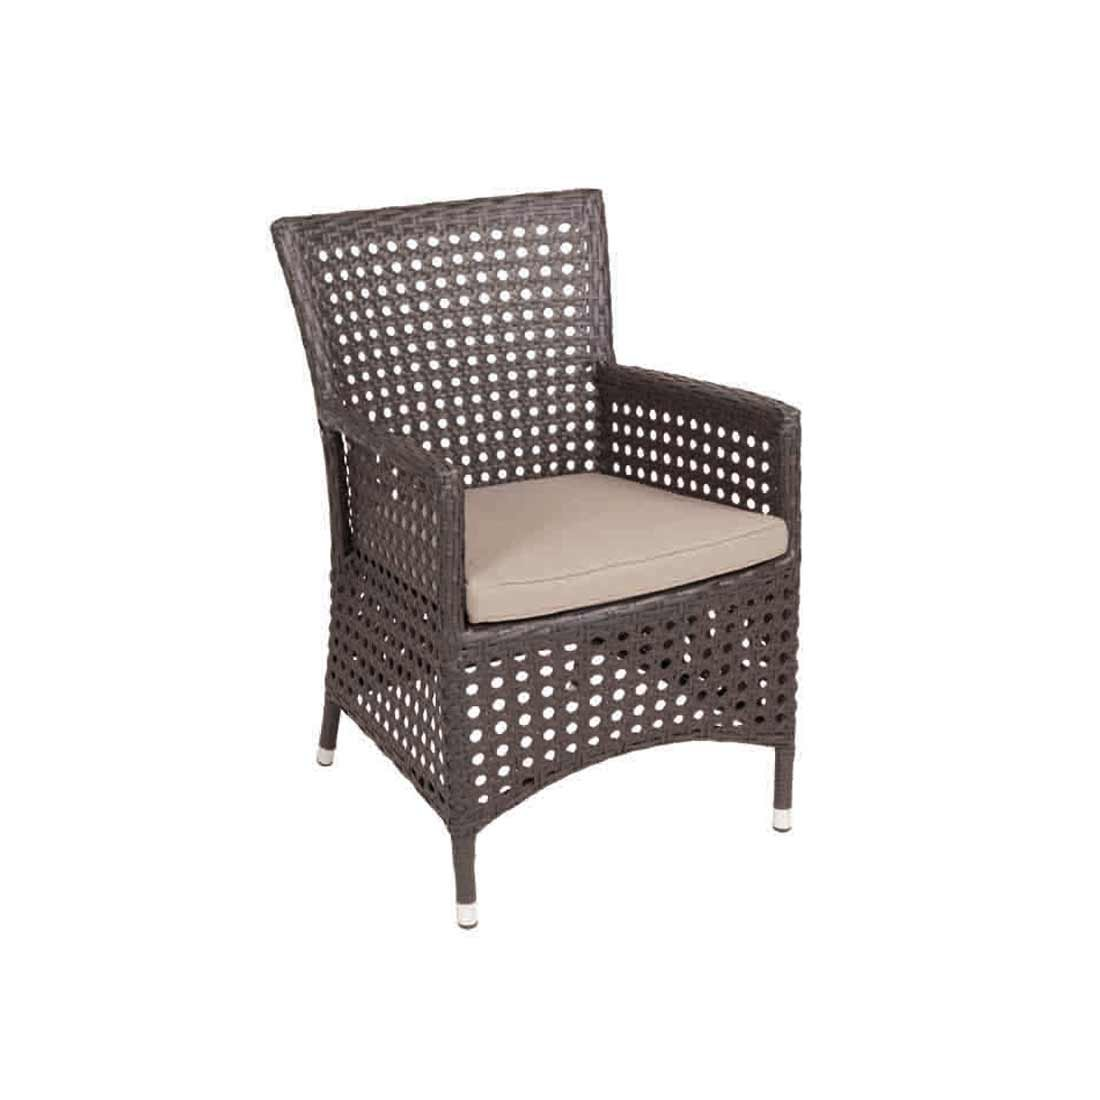 Diamond Garden Sessel Dublin braun online kaufen